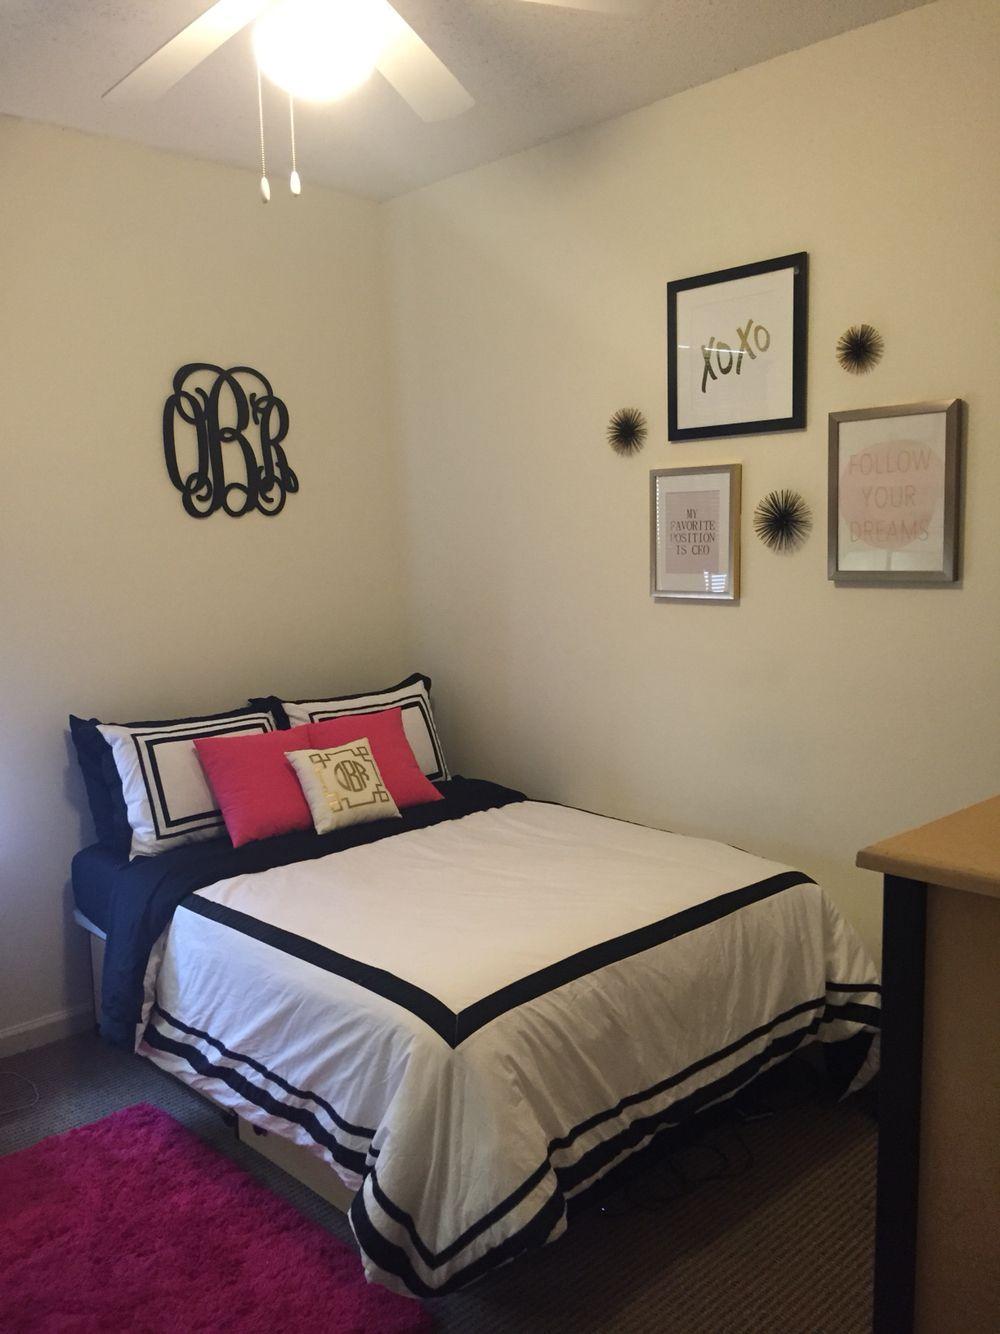 Utc Dorm Room Stophel